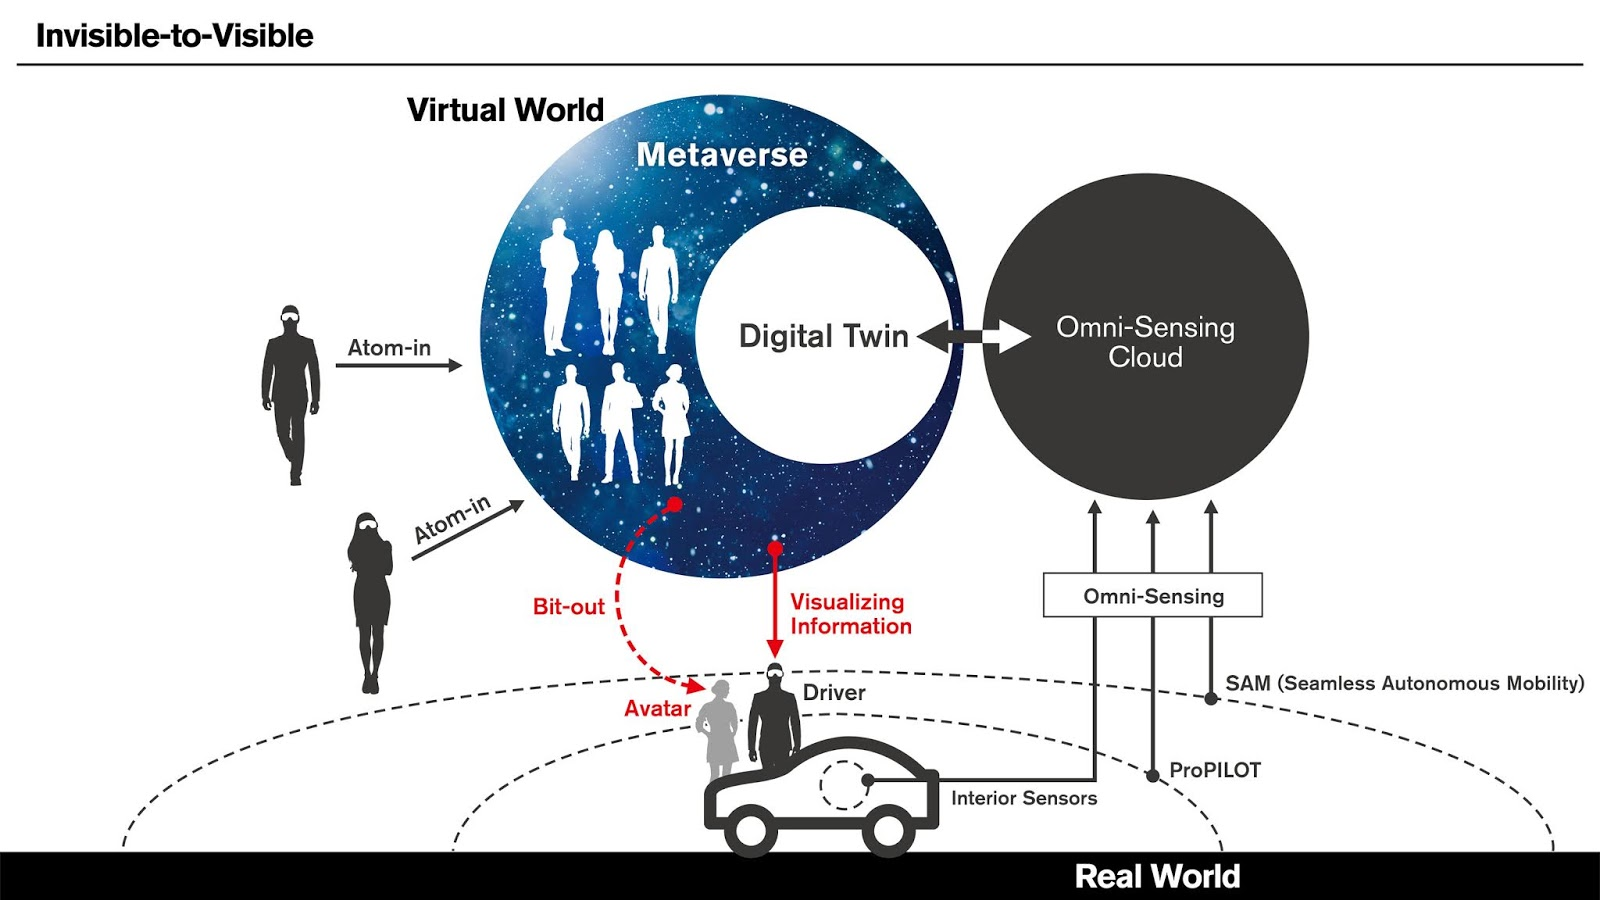 NISSAN I2V 5 Η Nissan σχεδιάζει augmented reality για τα μοντέλα της Nissan, zblog, τεχνικά, Τεχνολογία